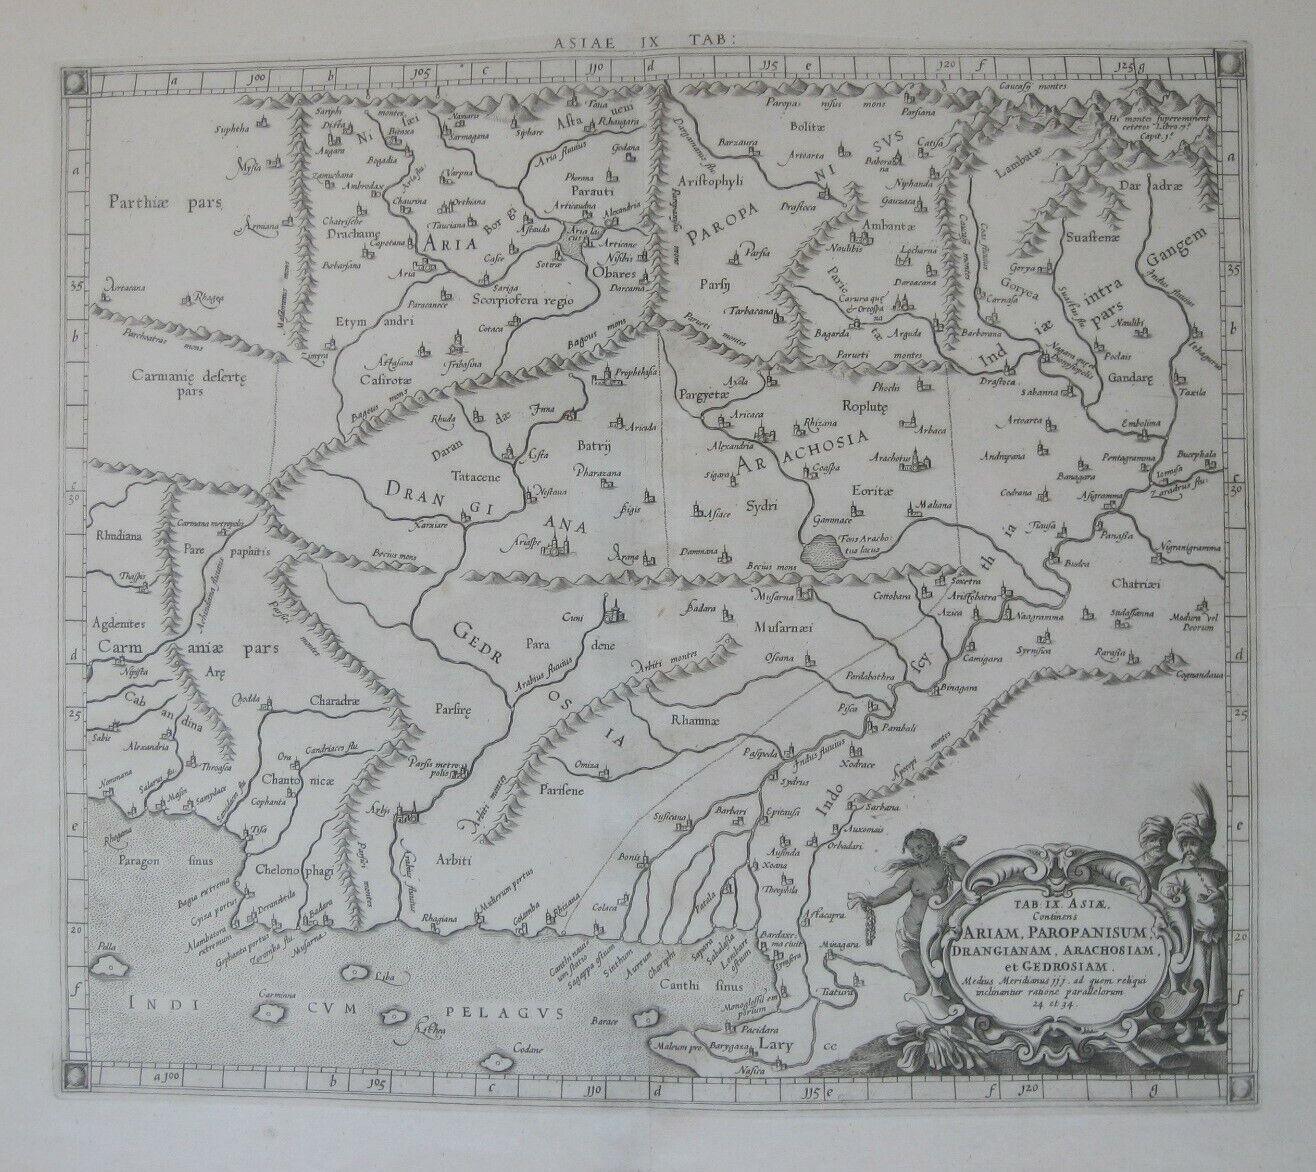 Original 1670 Ptolemy Gerard Mercator Map PAKISTAN INDIA AFGHANISTAN Indus River